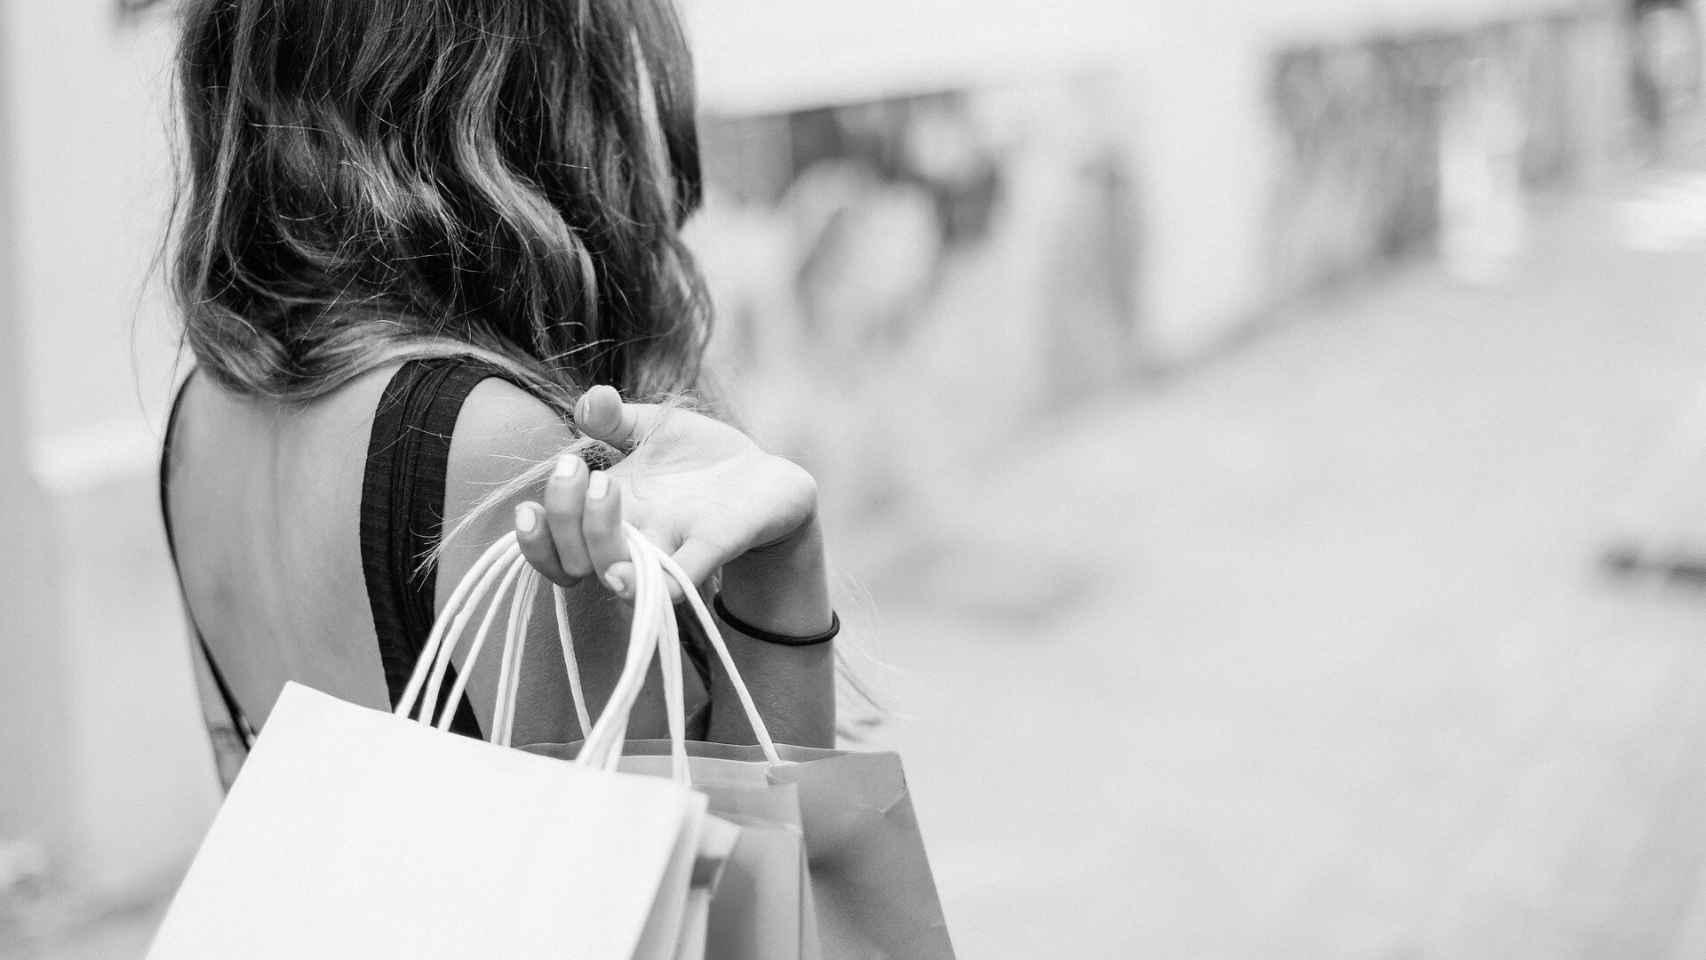 ¿Recuerdas cuando íbamos de compras?